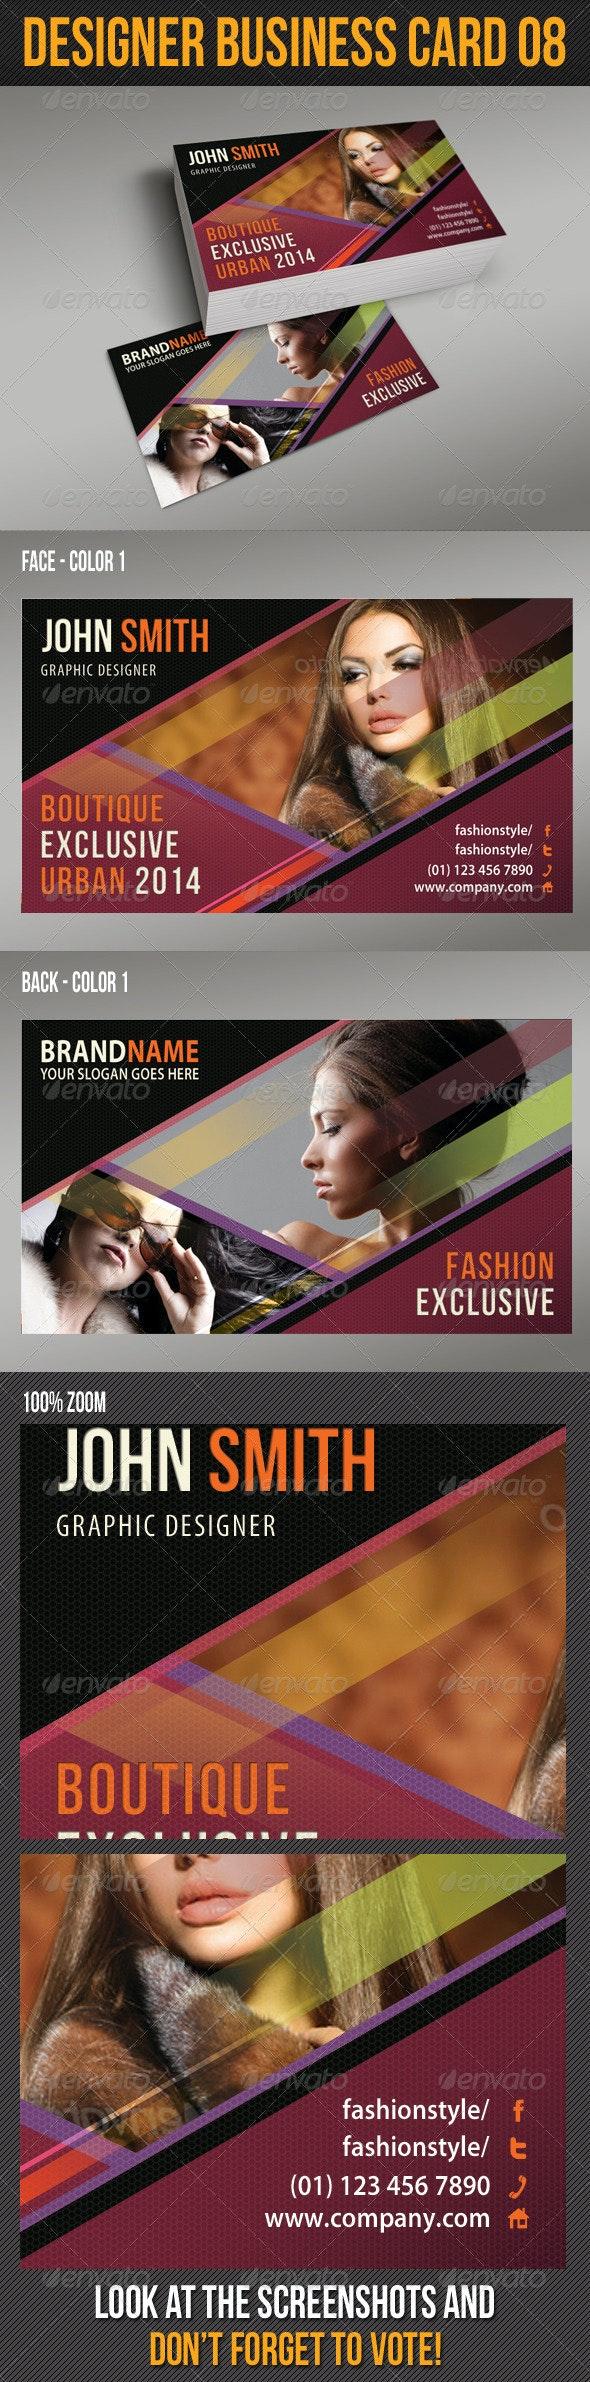 Designer Business Card 09 - Creative Business Cards